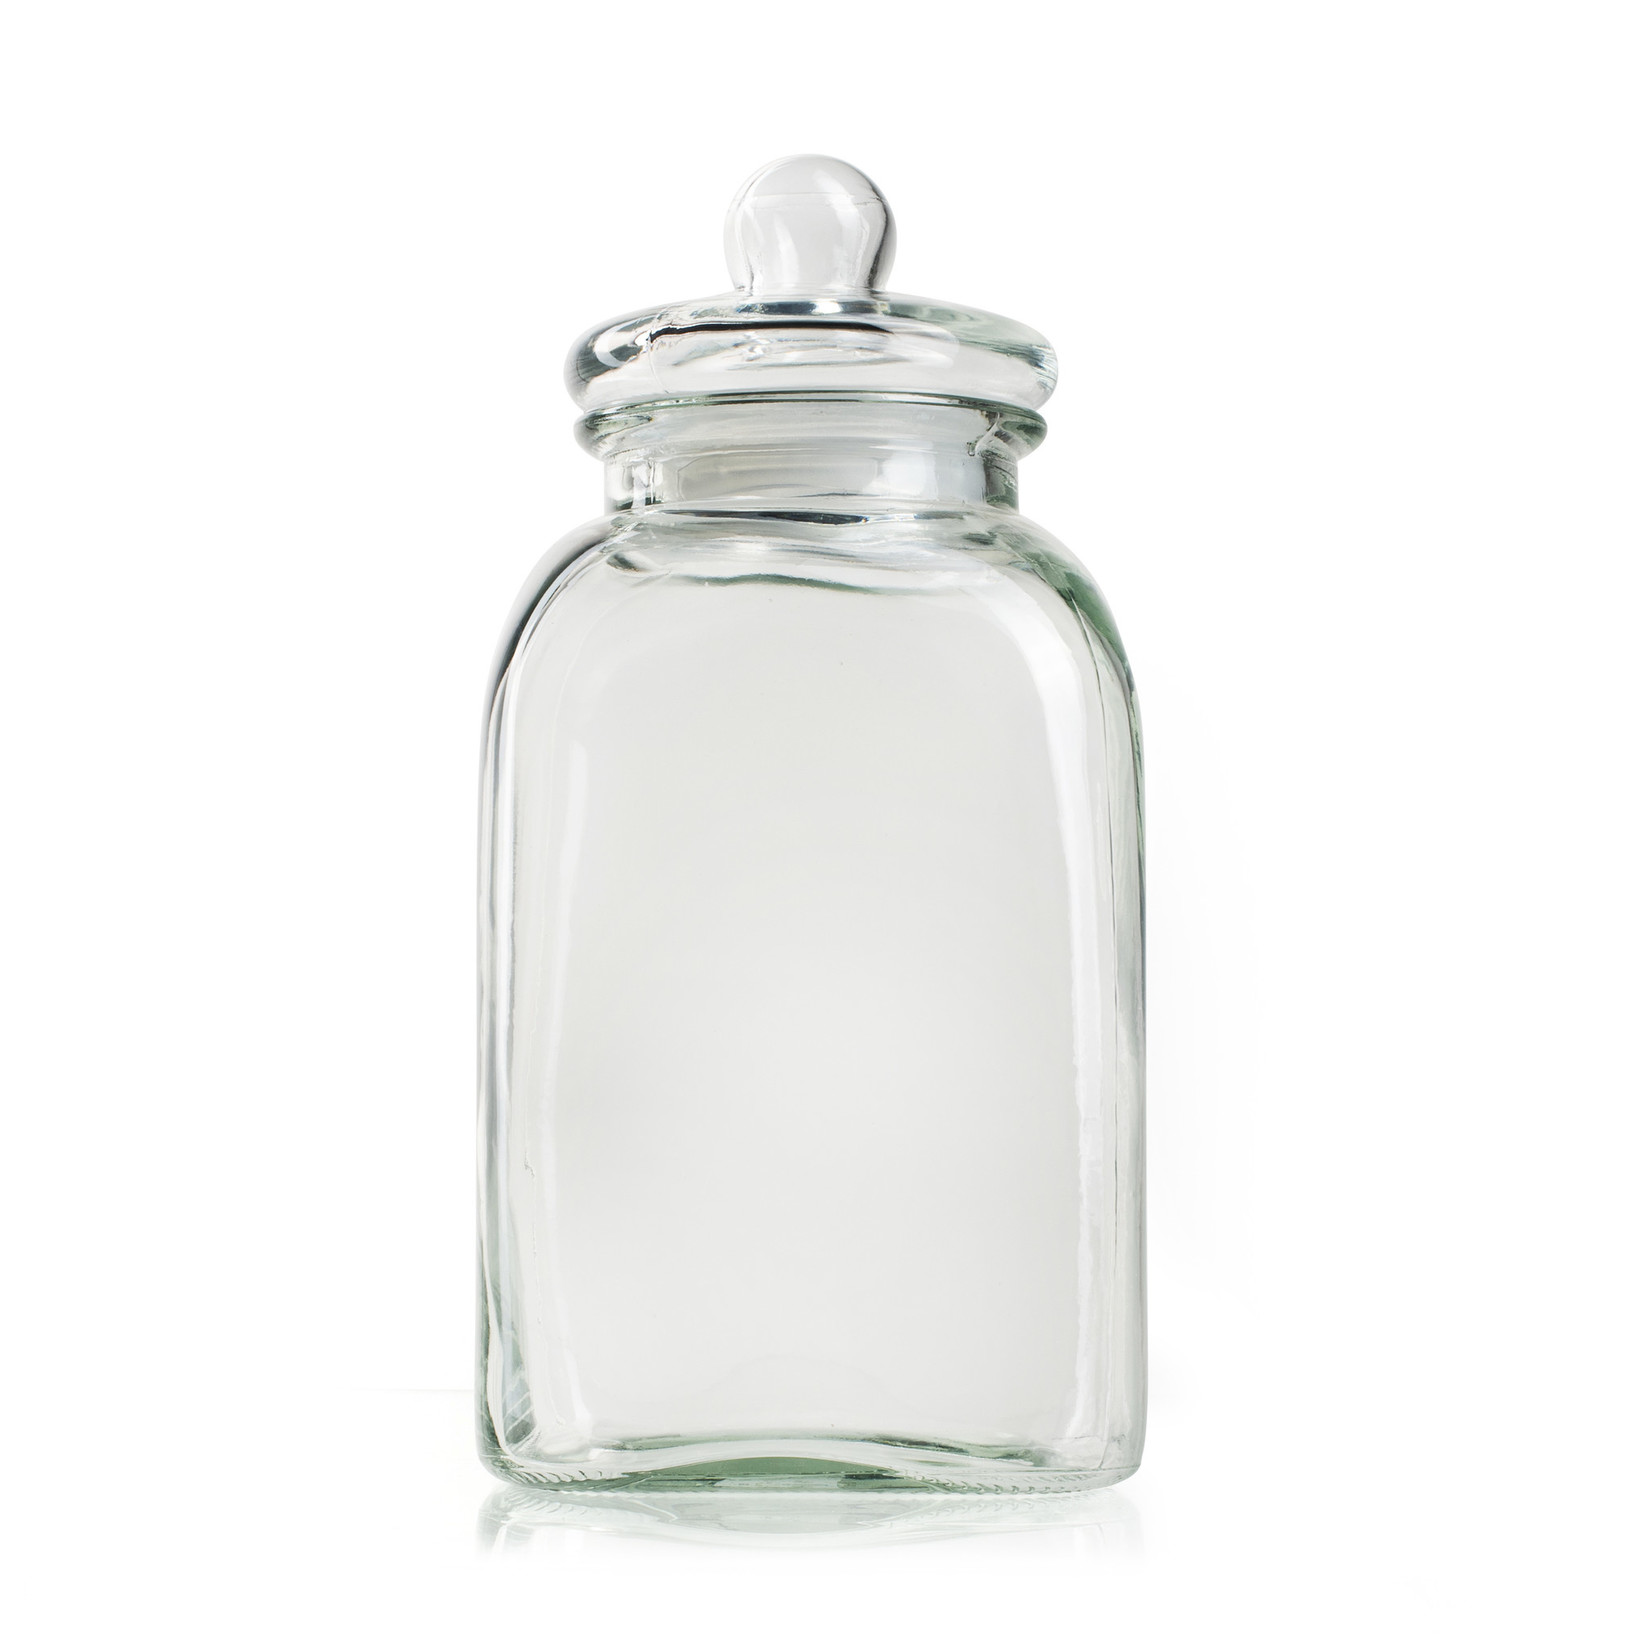 Jodeco Glass Glaspot met deksel 'Giel'